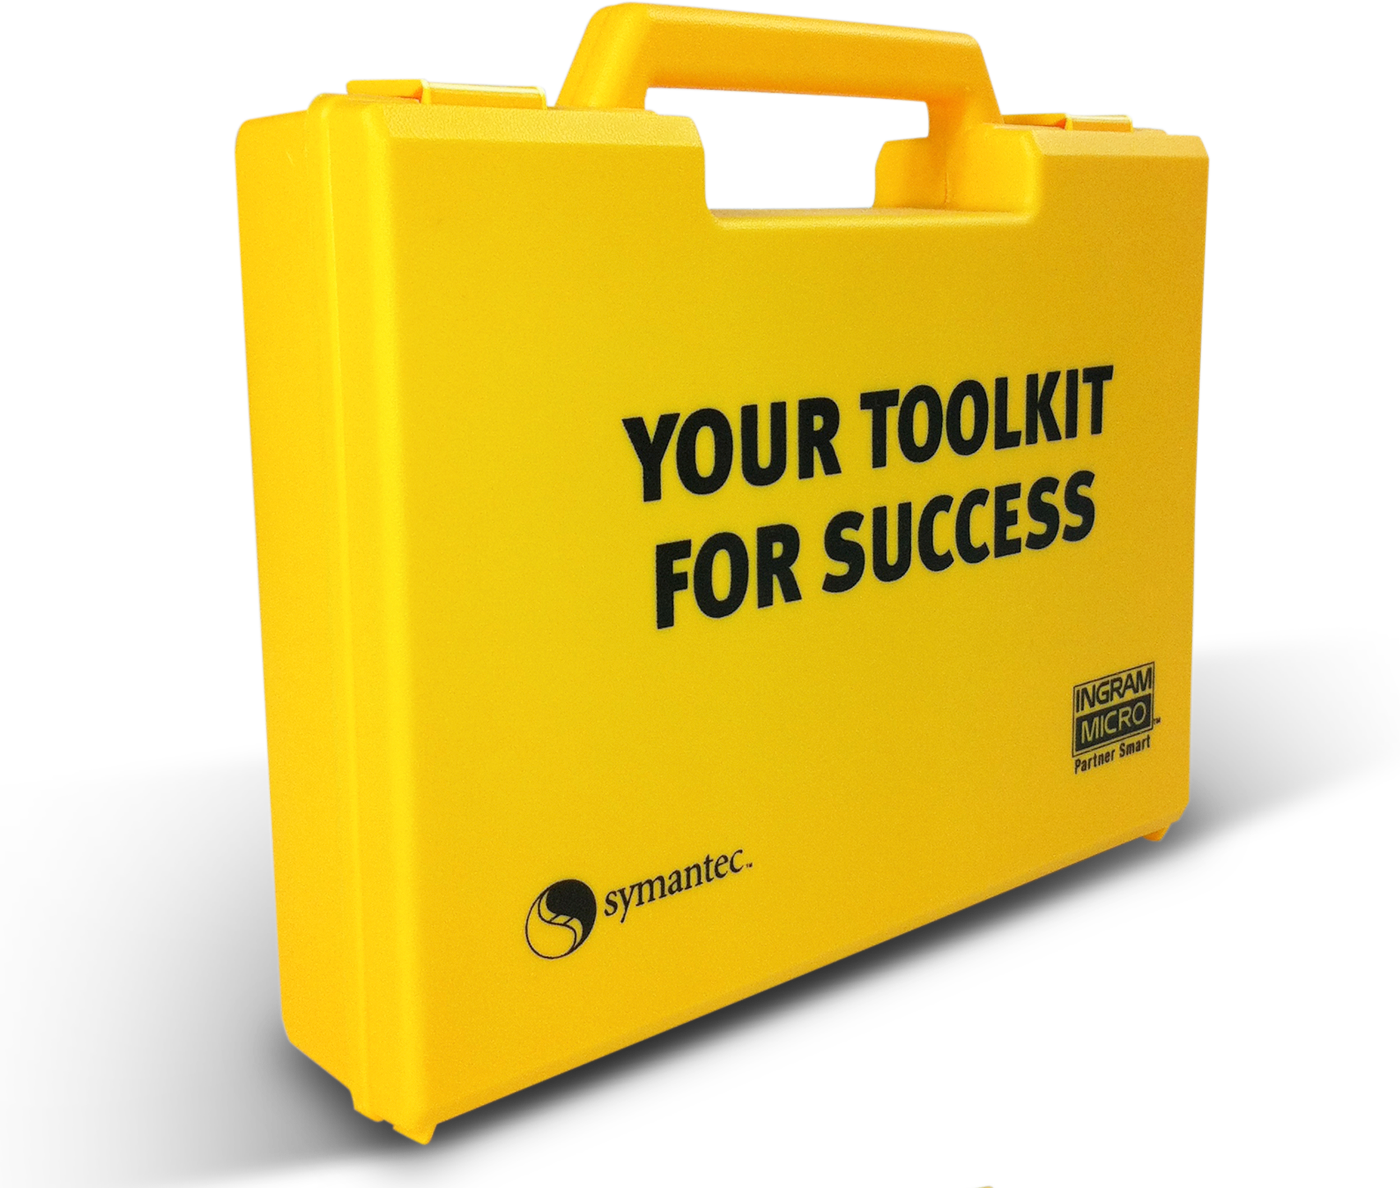 toolkit-box